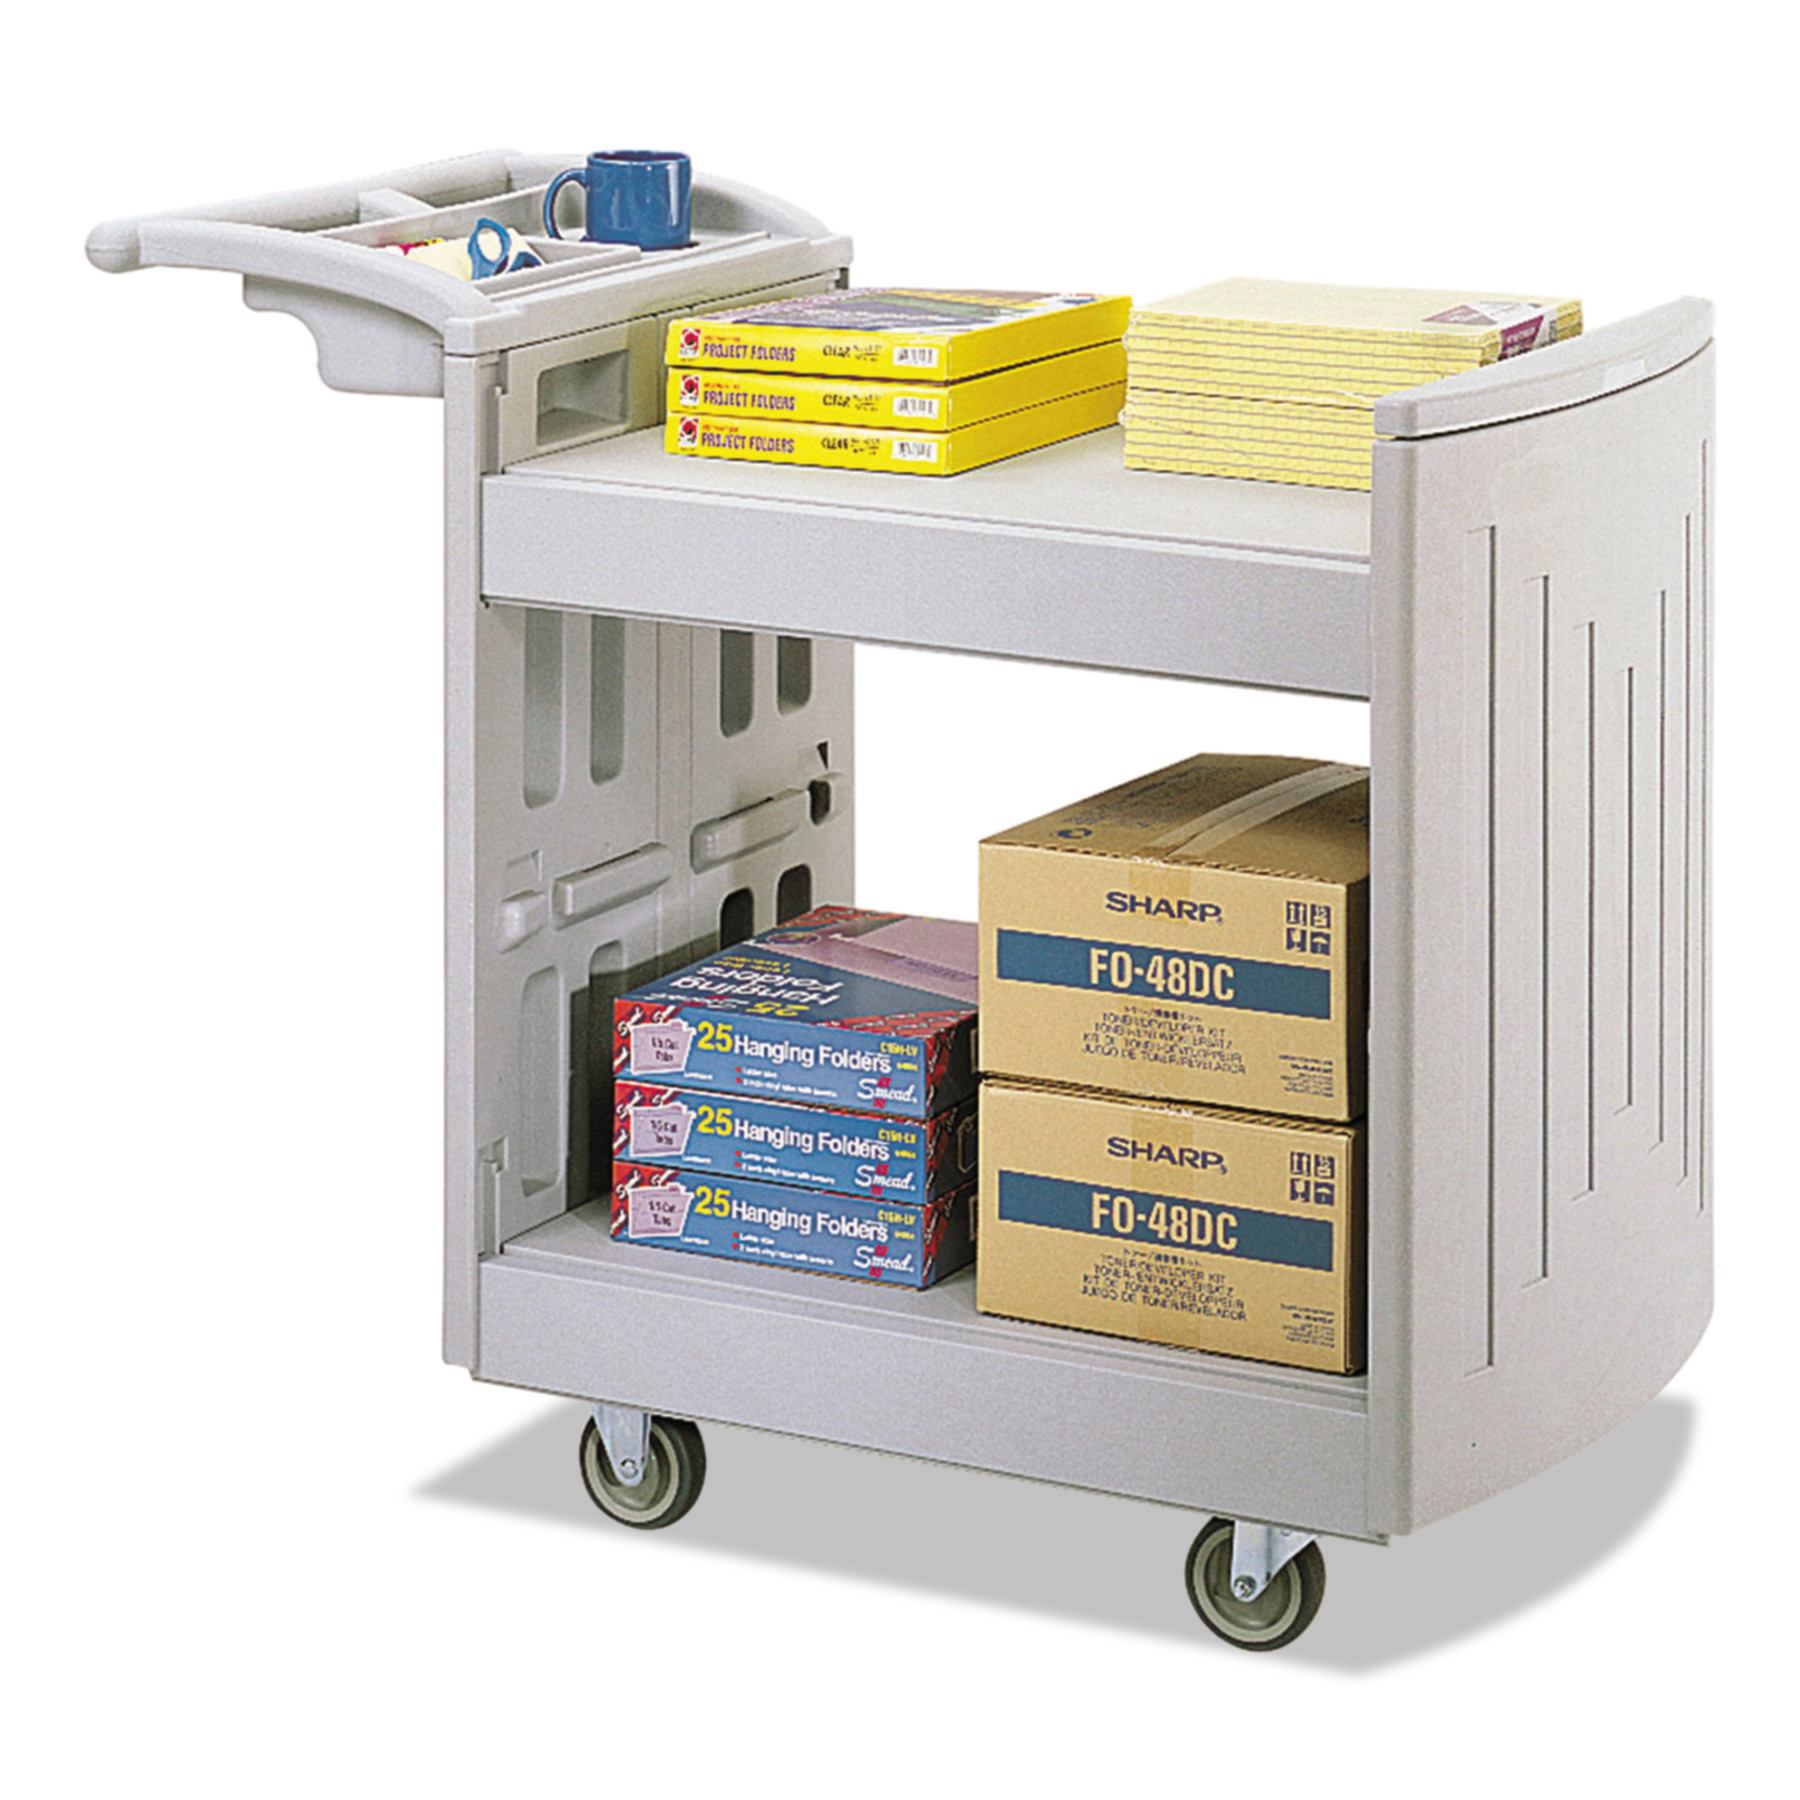 Safco Utility Cart, Two-Shelf, 45w x 23d x 37-1/4h, Light Gray